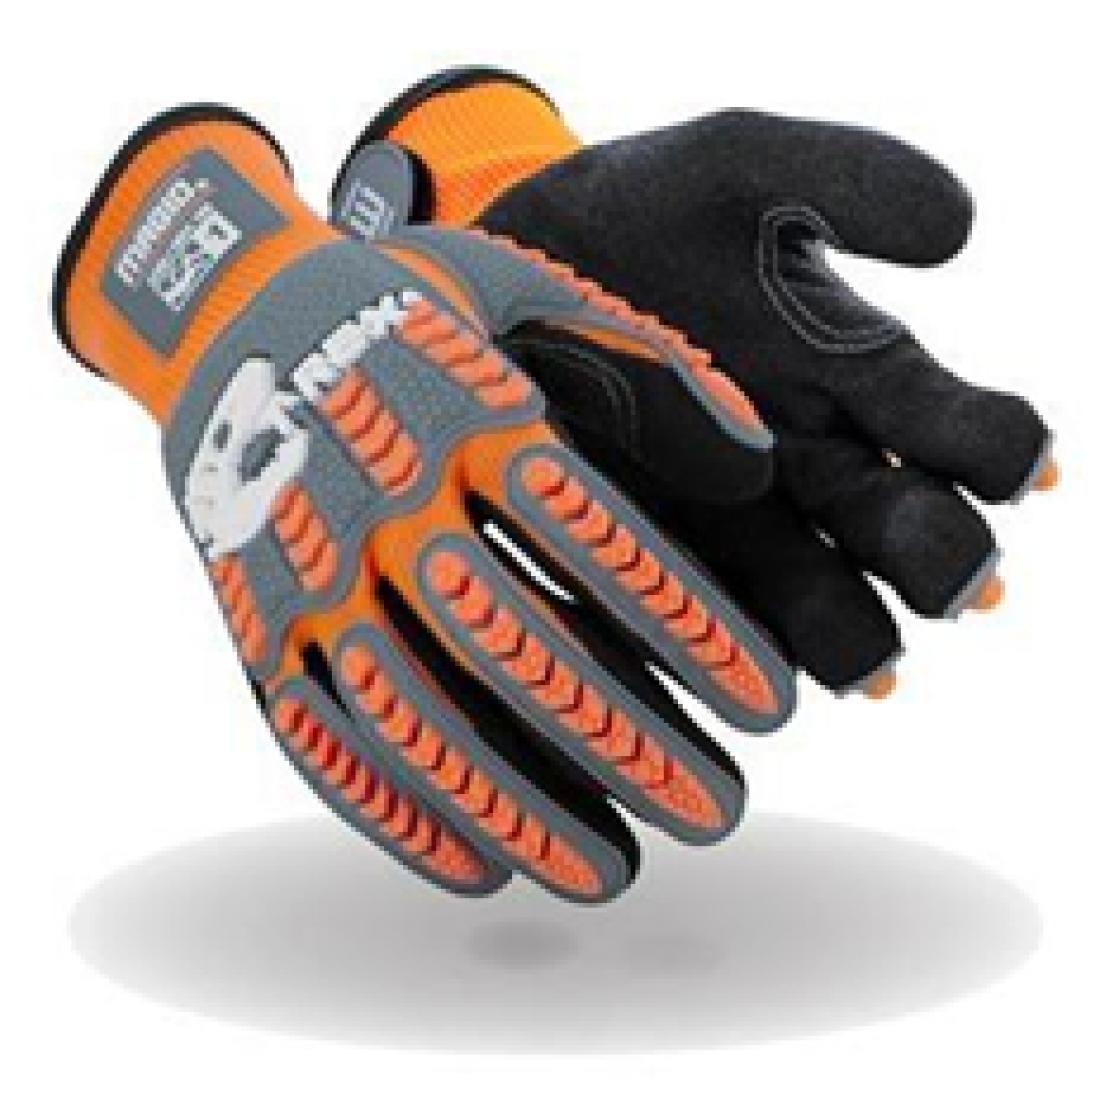 Waterproof Impact Glove